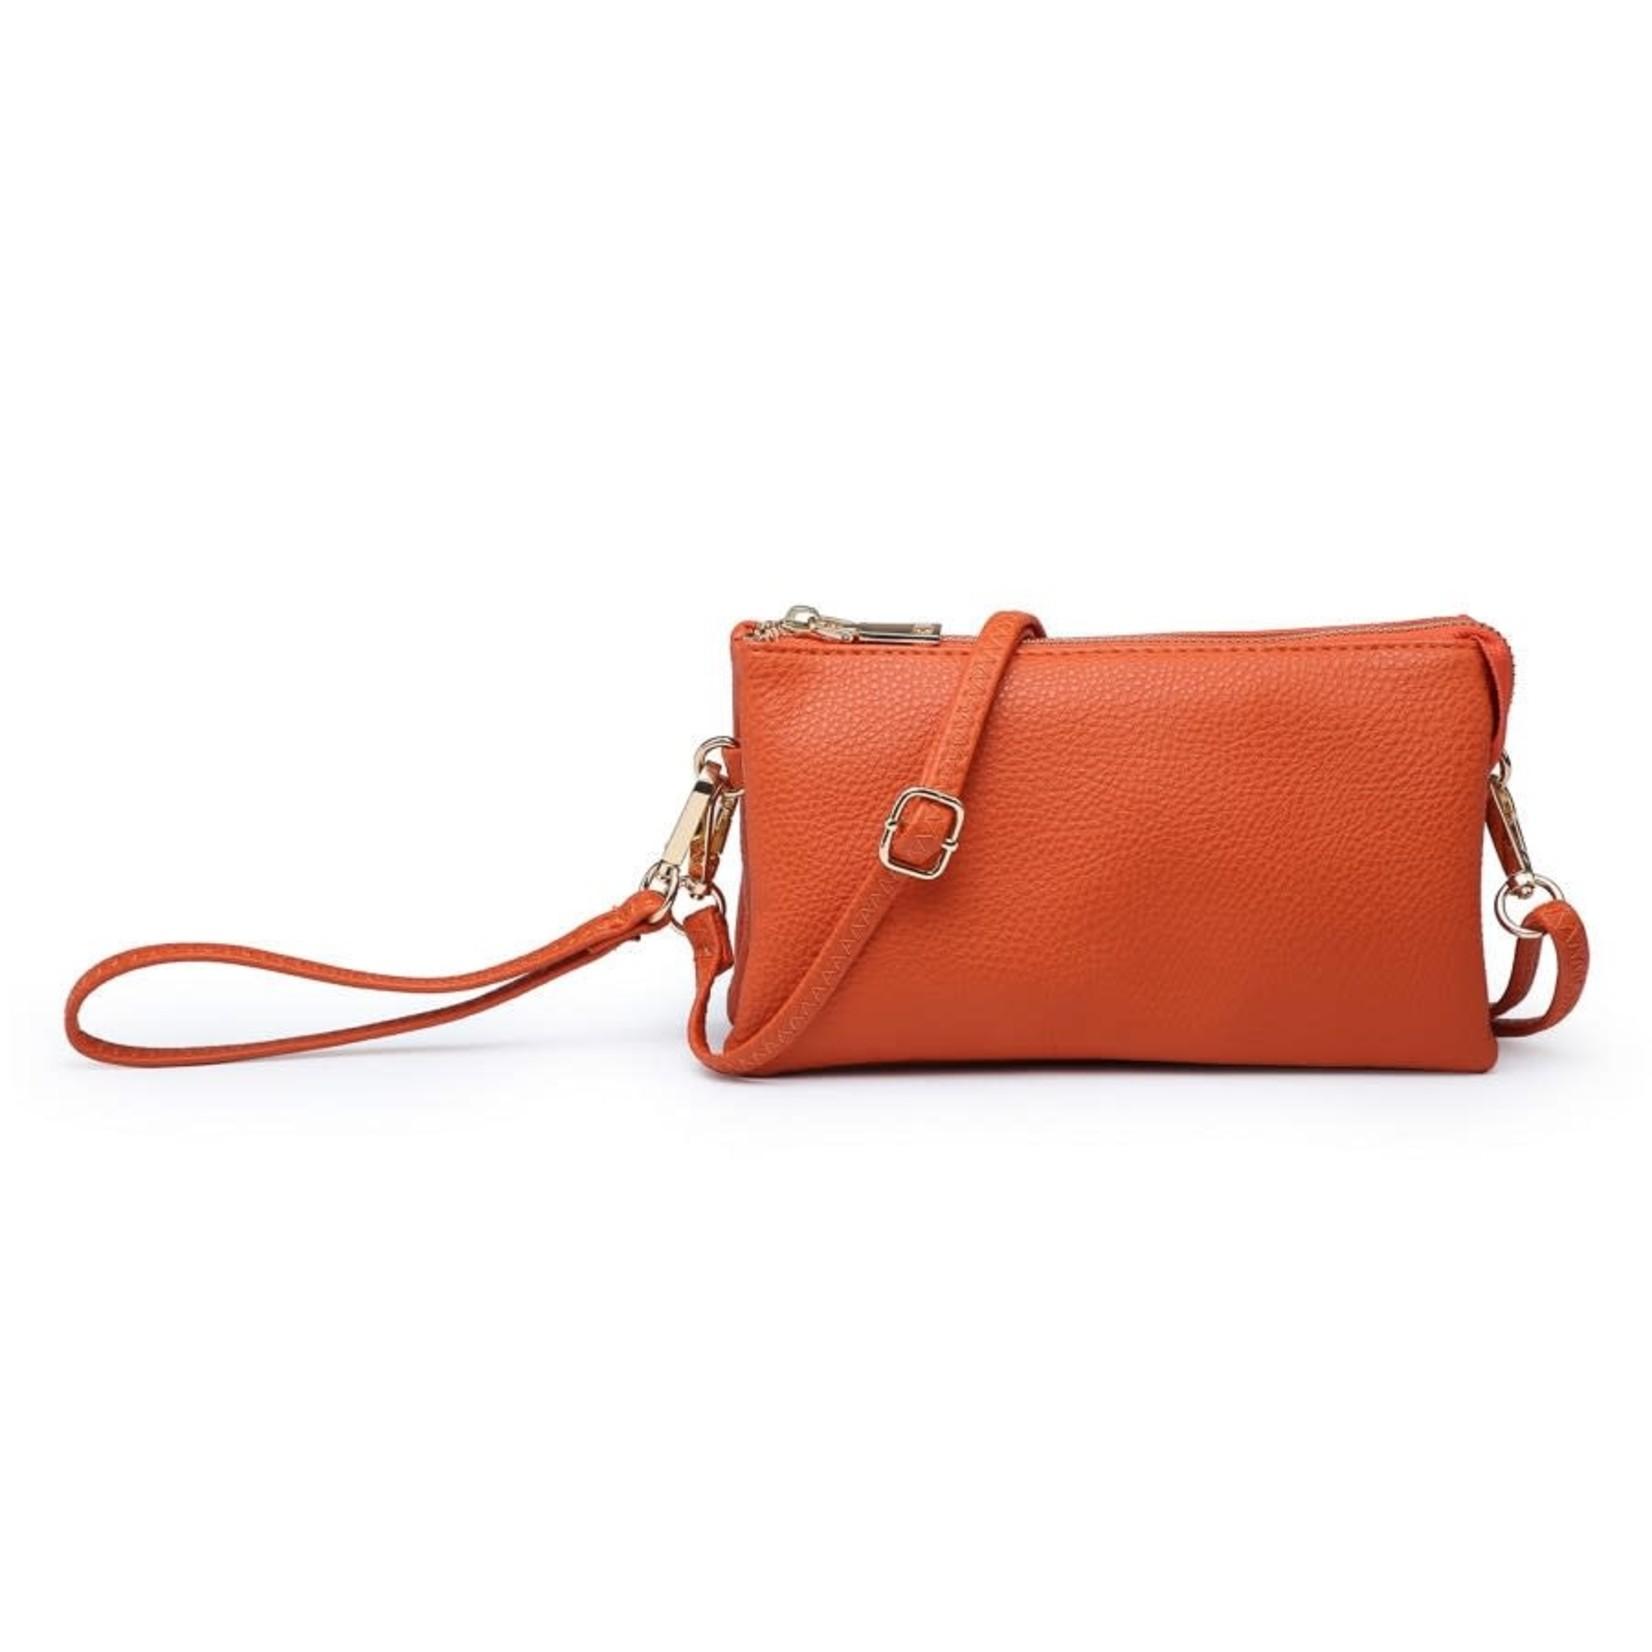 Riley - Vegan Leather Double-Sided Wristlet/Crossbody - Orange(OR)